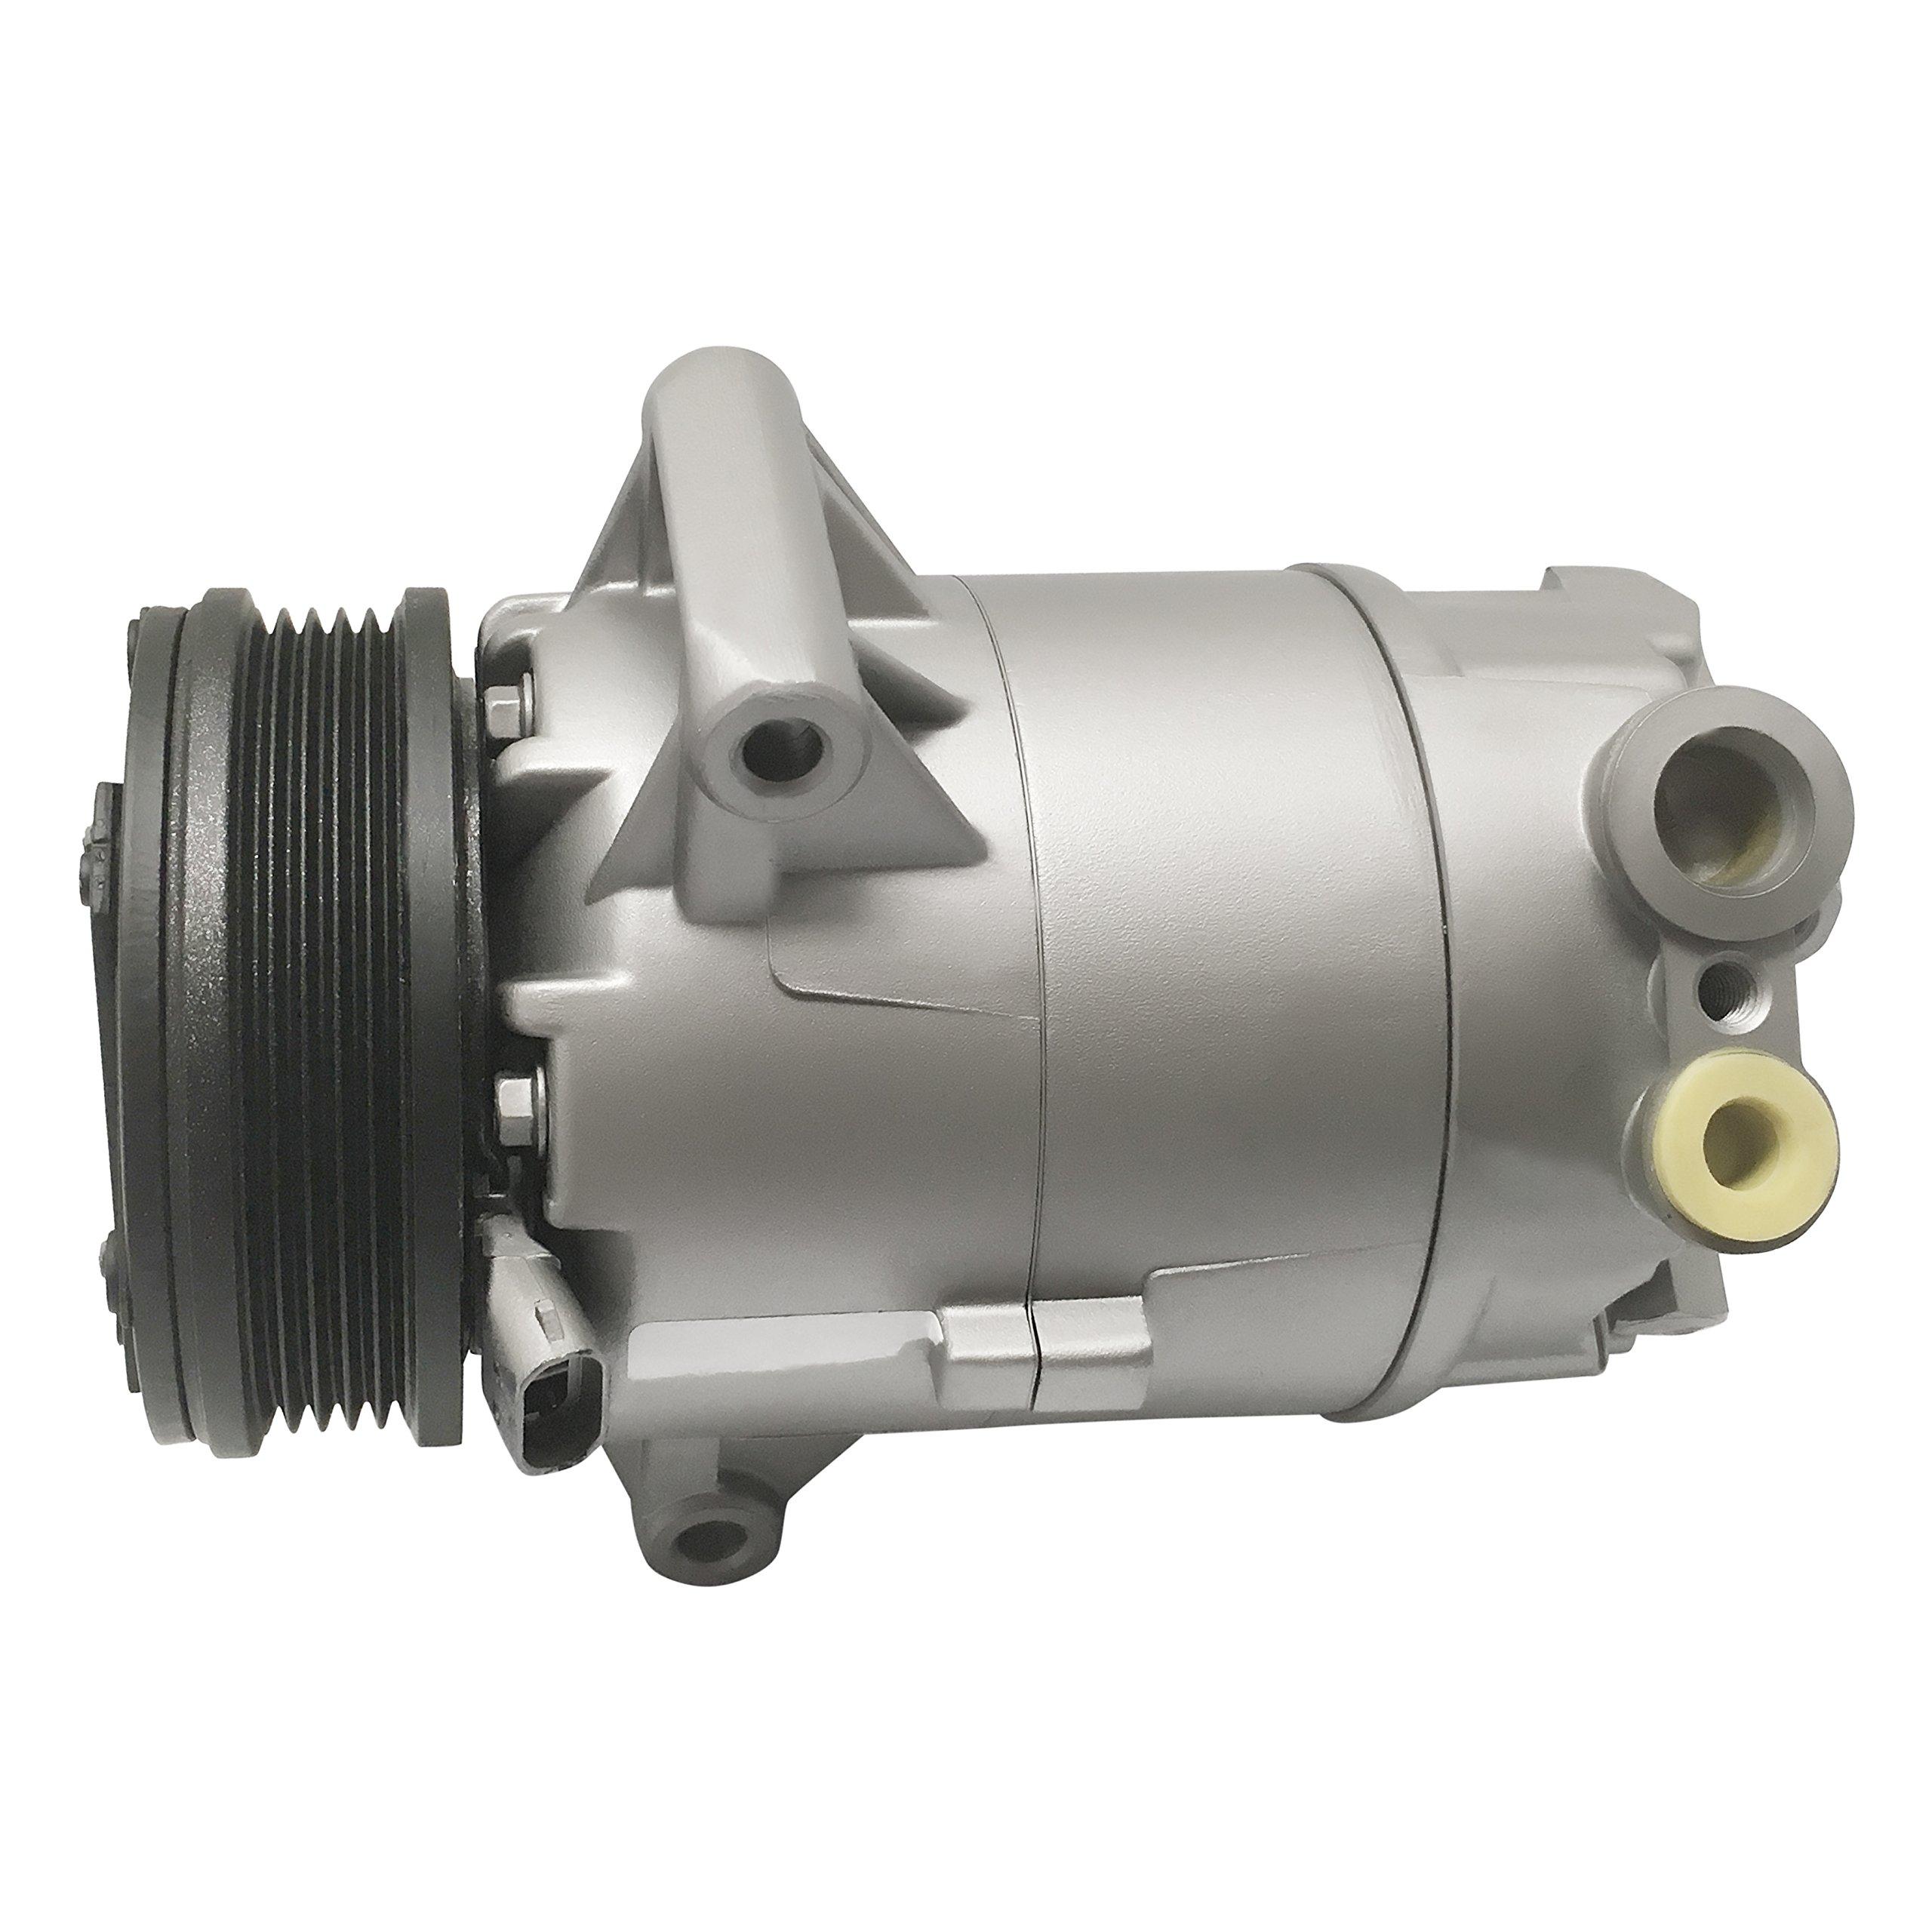 RYC Remanufactured AC Compressor and A/C Clutch FG275